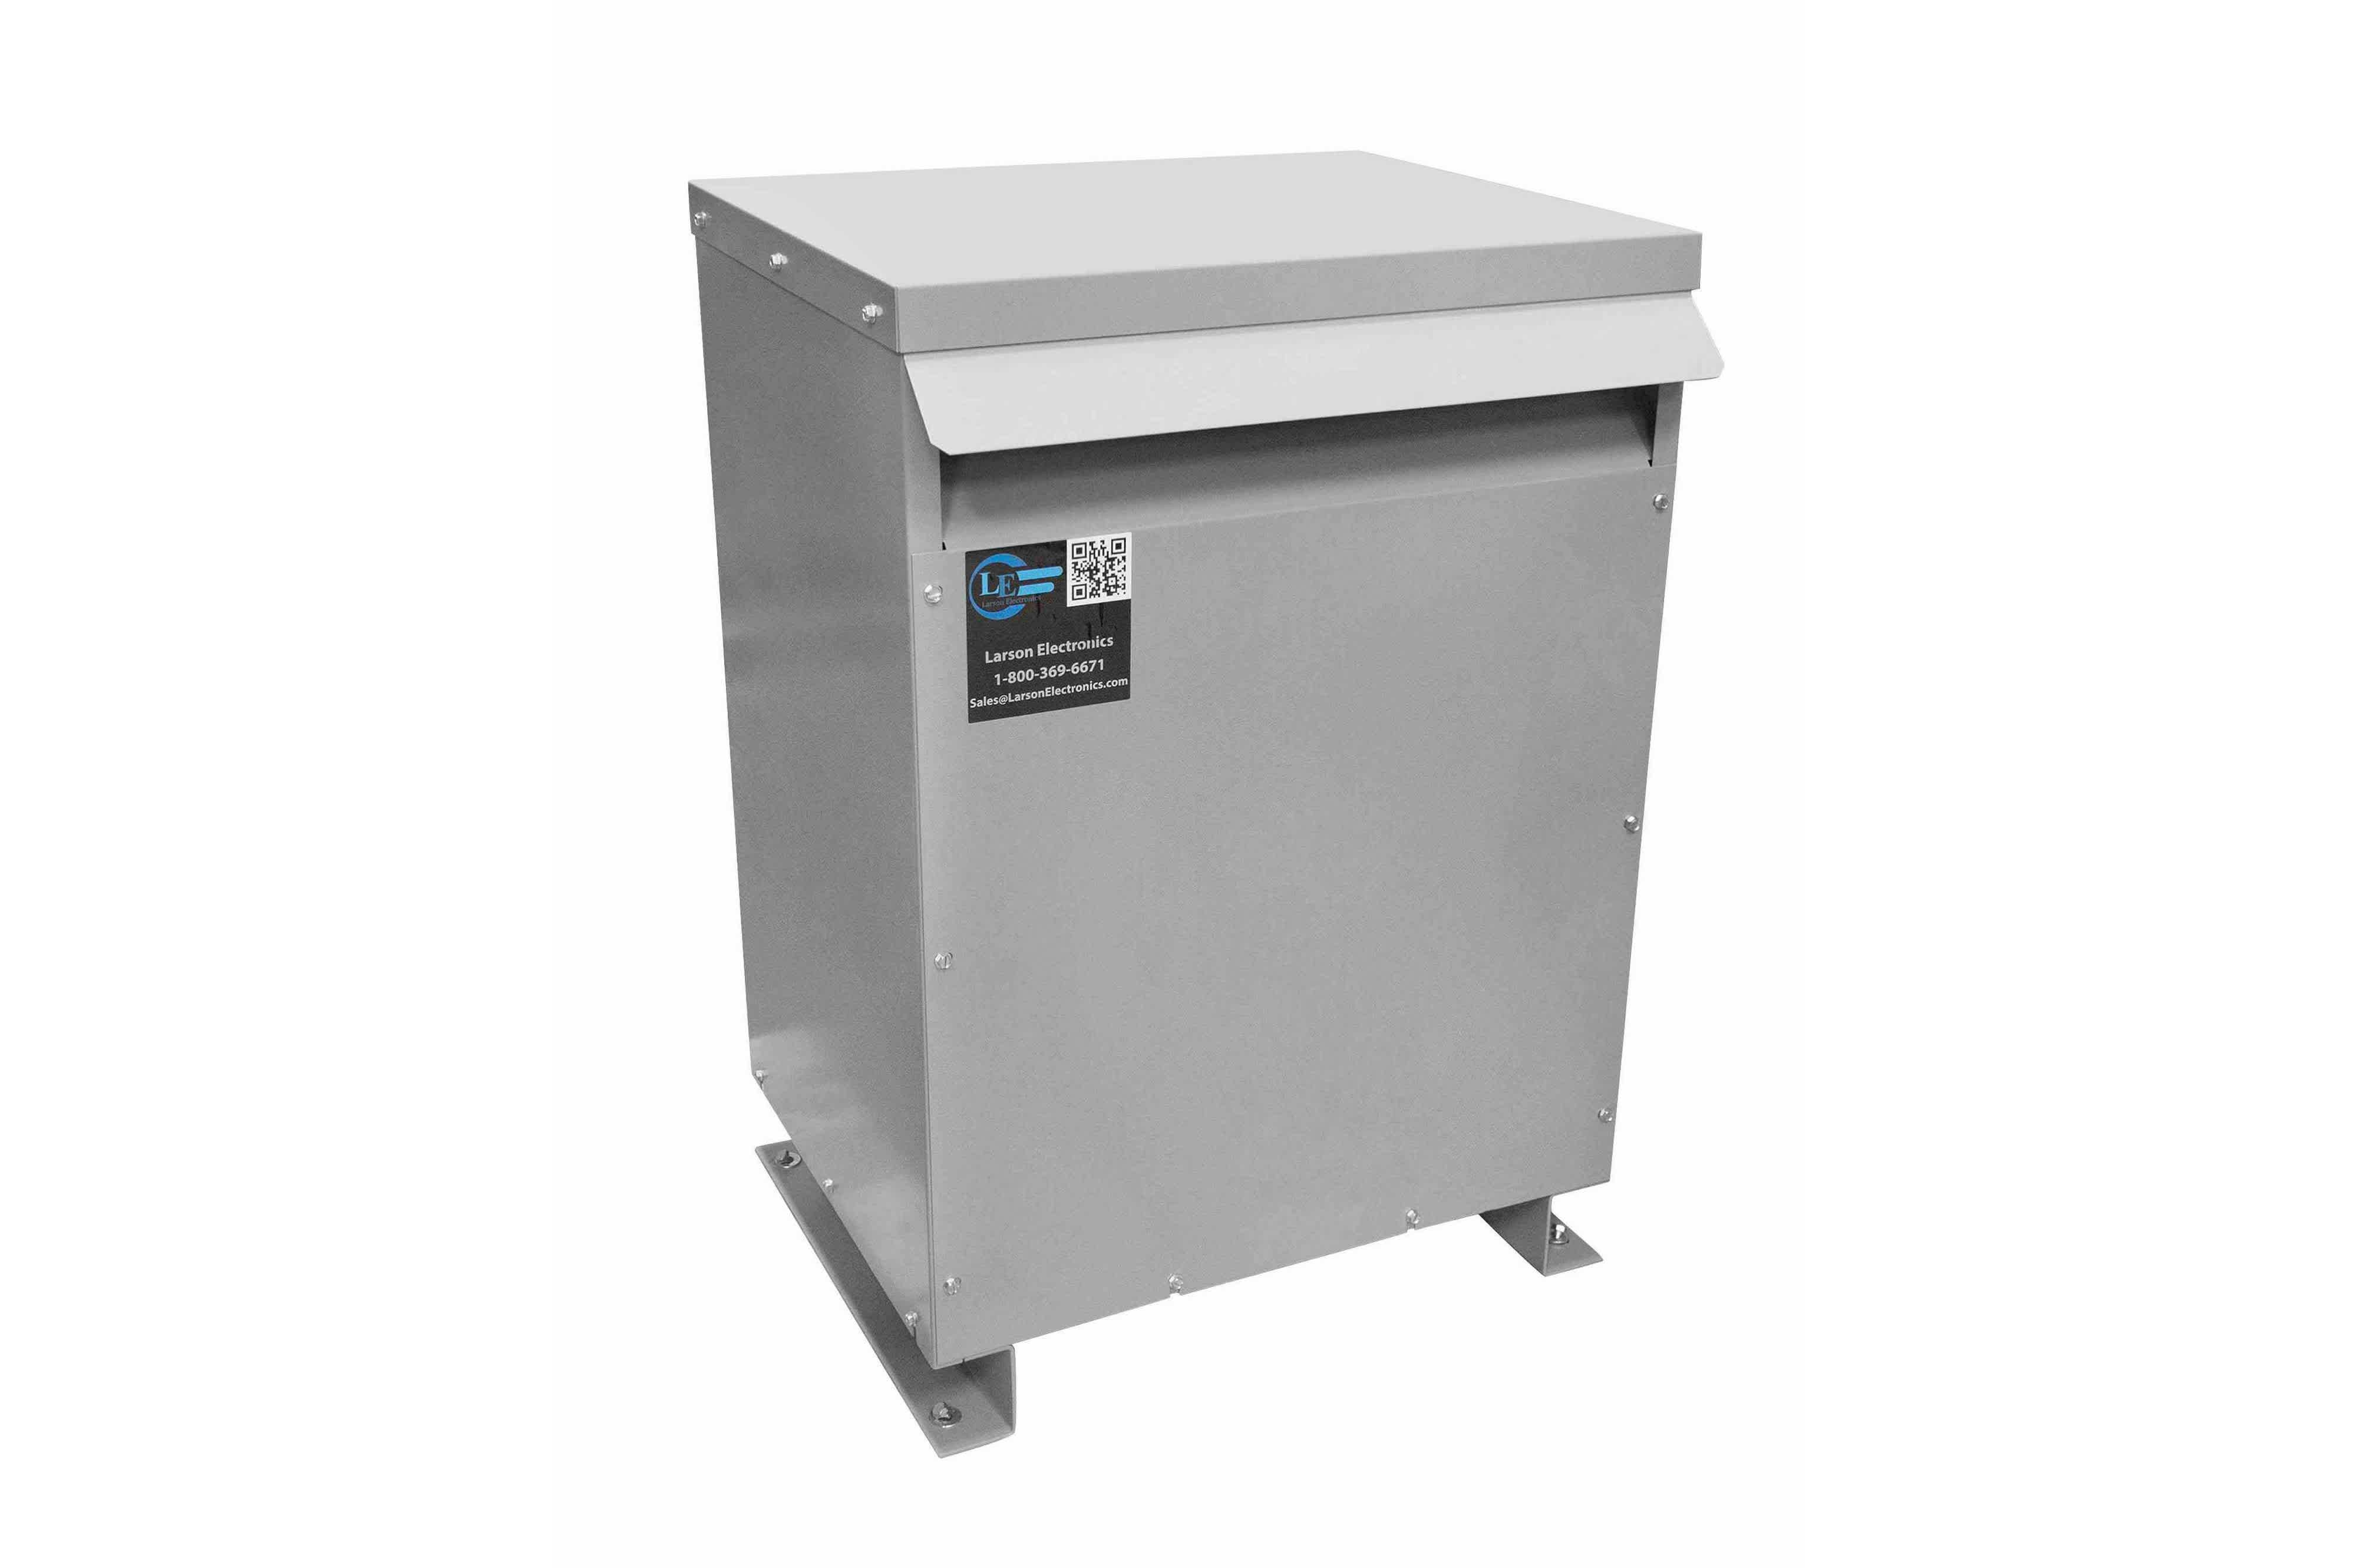 125 kVA 3PH Isolation Transformer, 400V Wye Primary, 600V Delta Secondary, N3R, Ventilated, 60 Hz